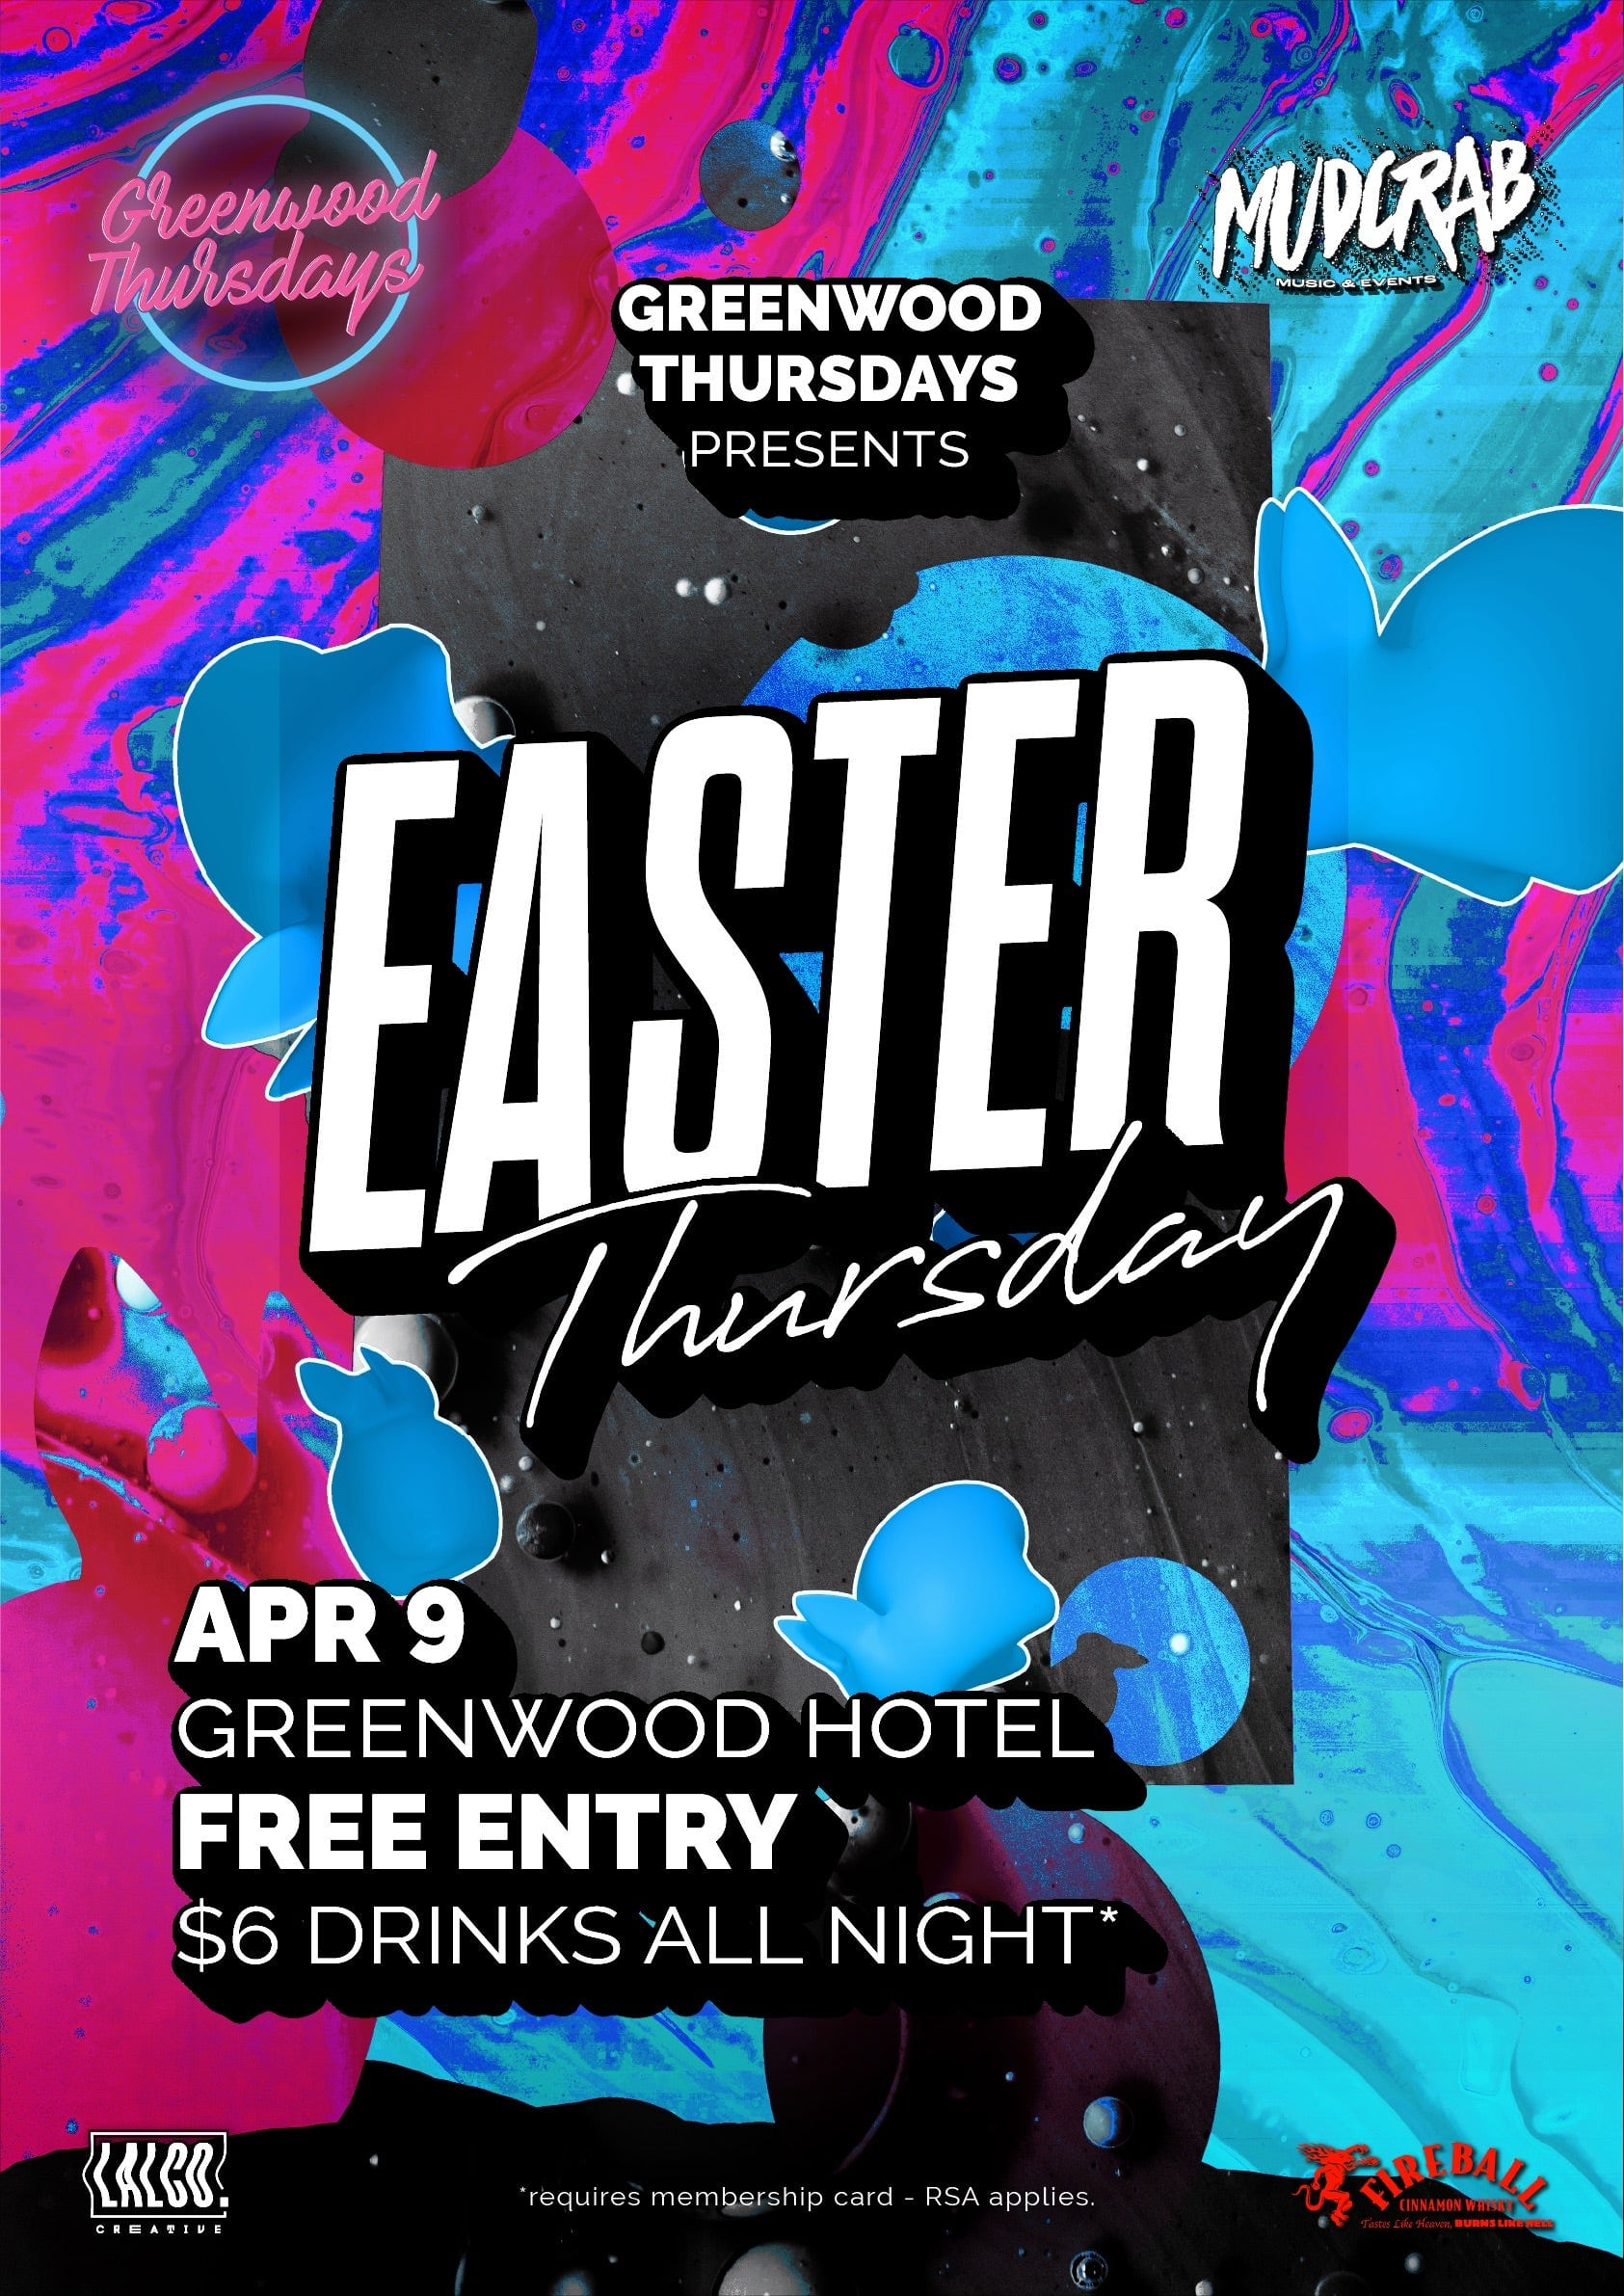 Easter Thursday Greenwood Thursdays North Sydney